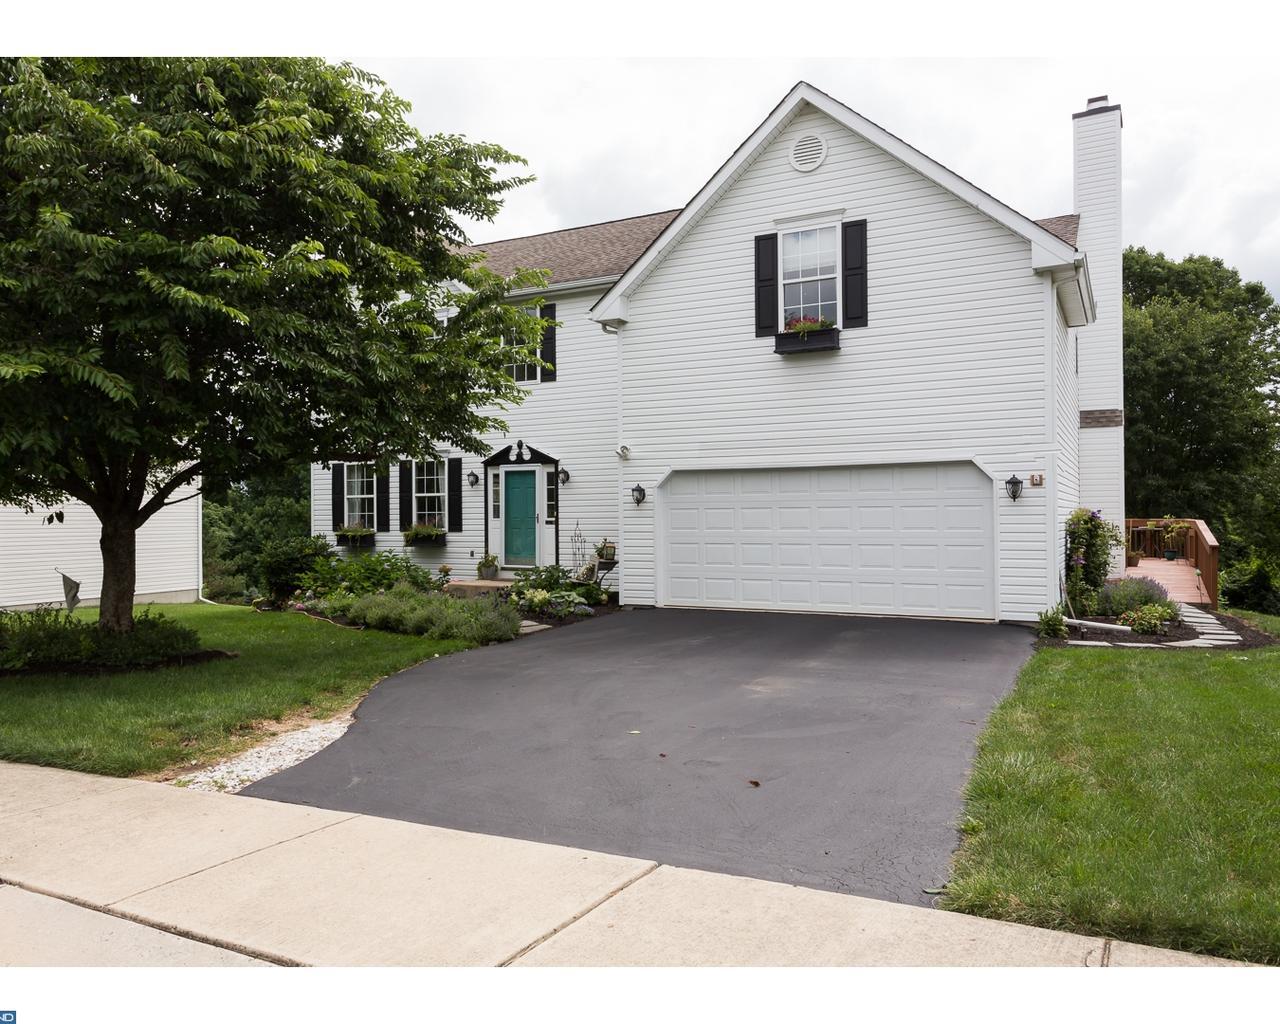 Property for sale at 109 JOHN STEVENS DR, Coatesville,  PA 19320